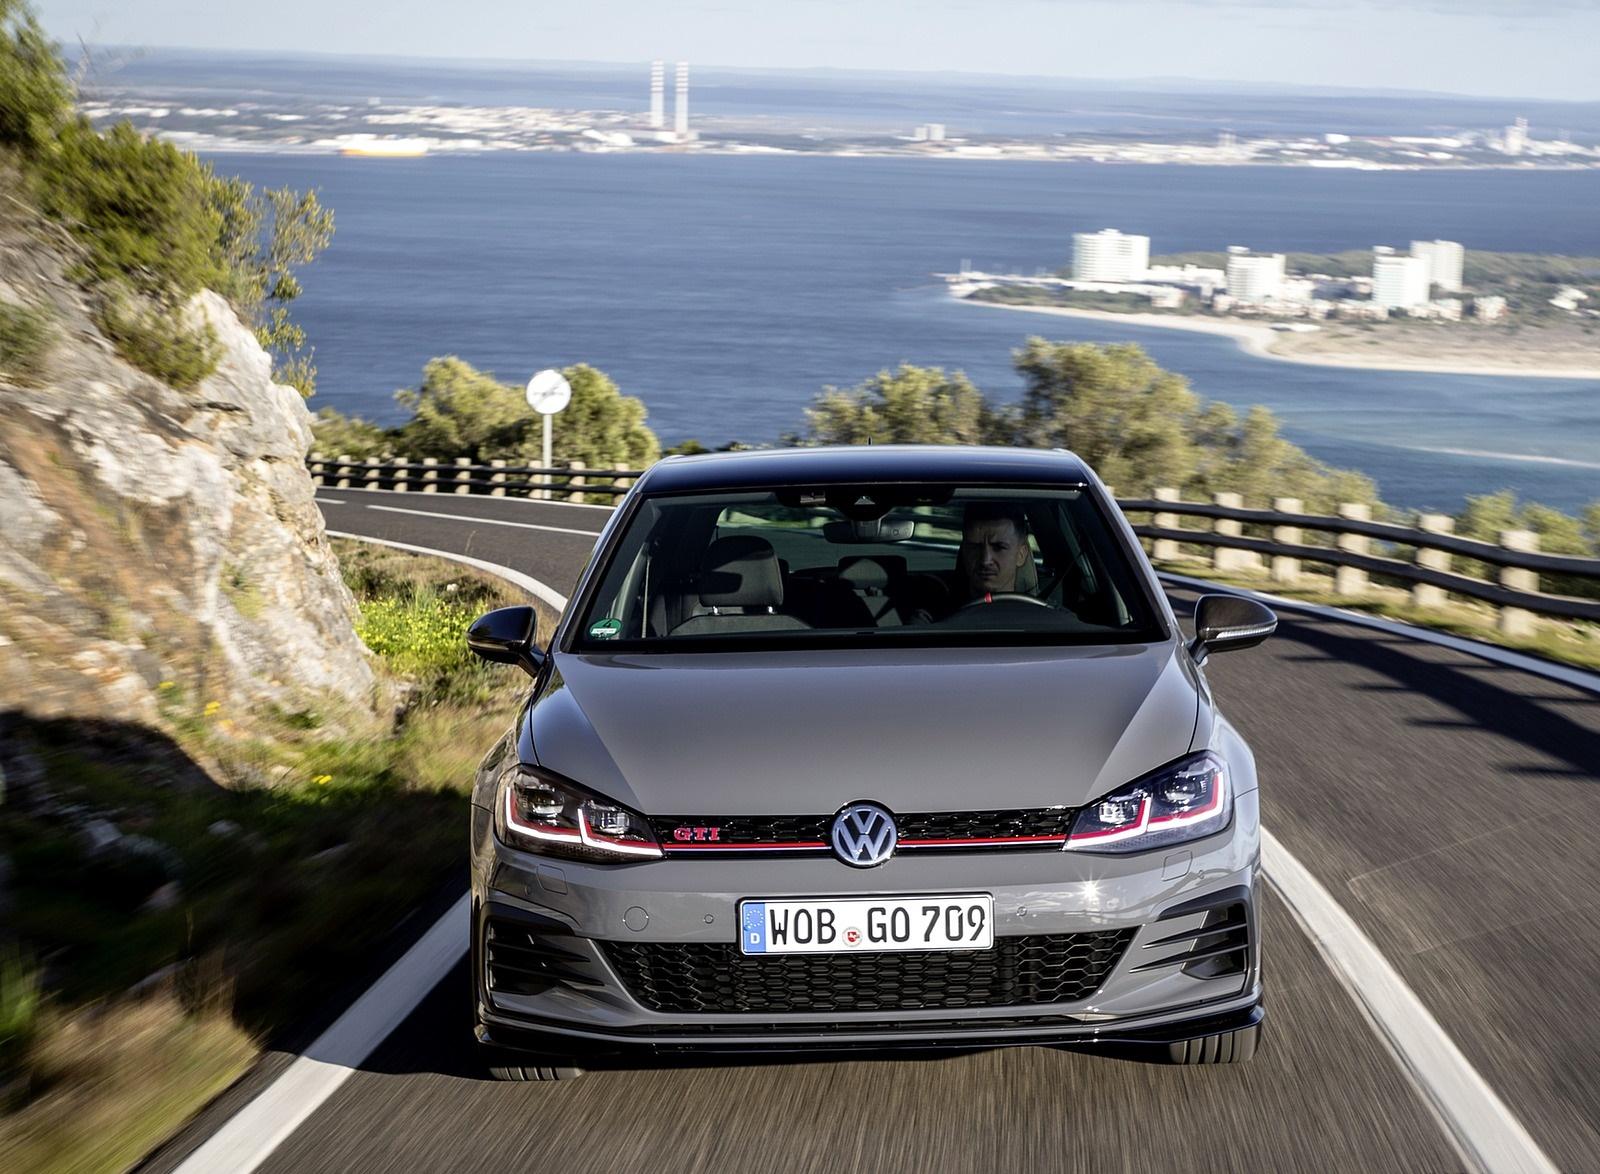 2019 Volkswagen Golf GTI TCR Front Wallpaper (15)